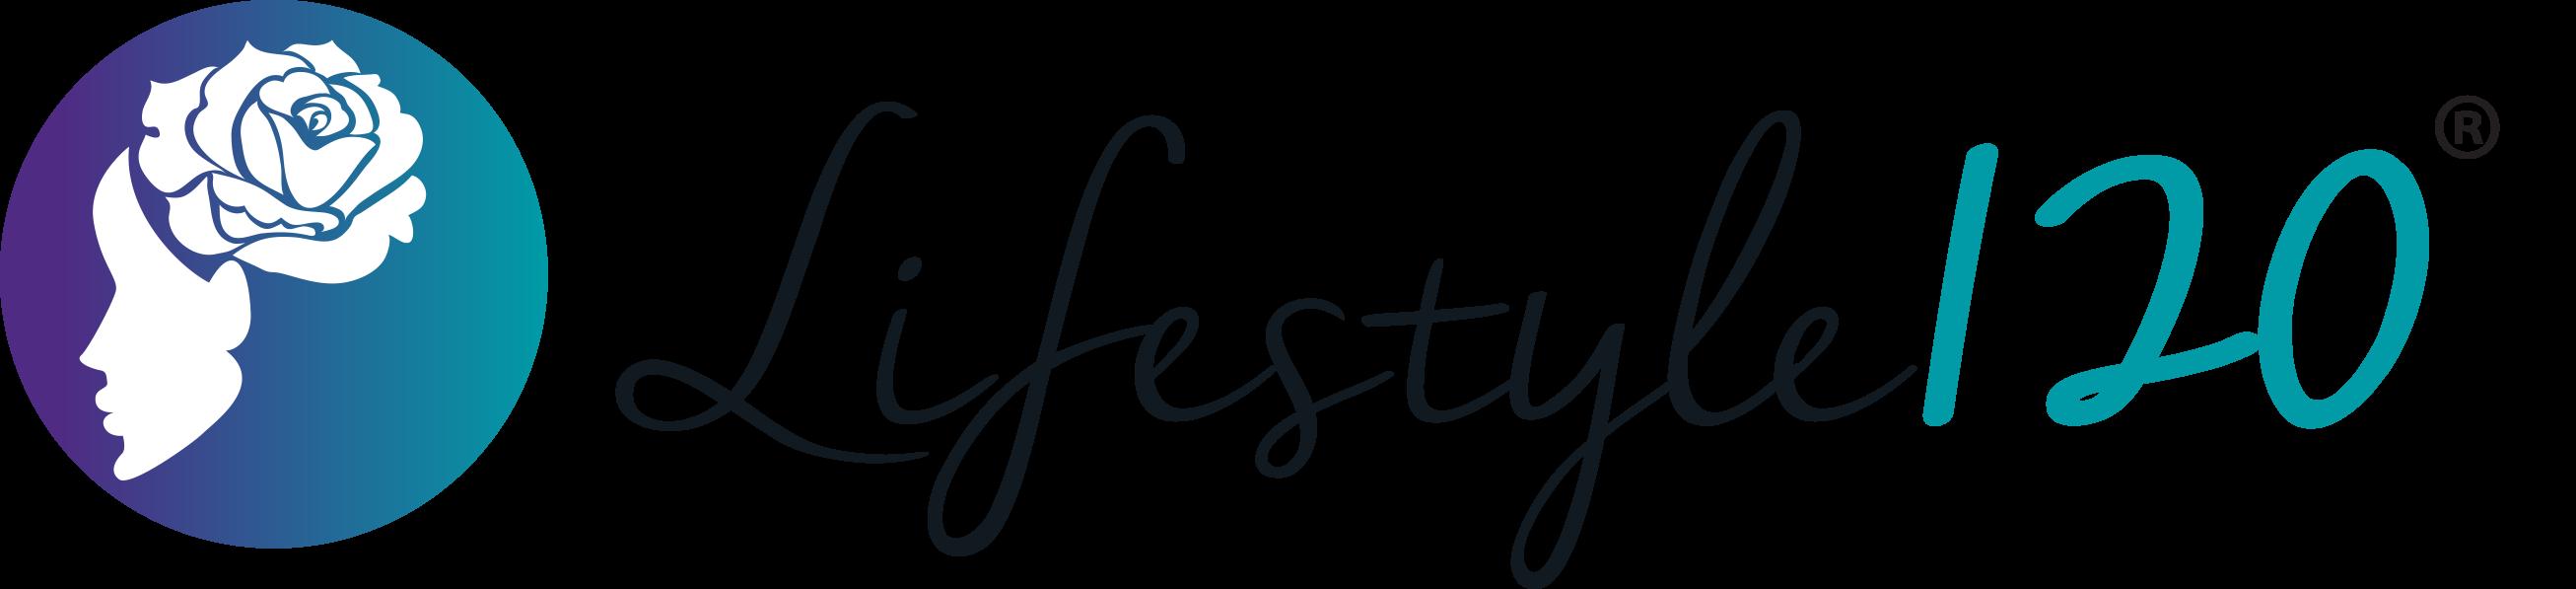 New Lifestyle 120 logo